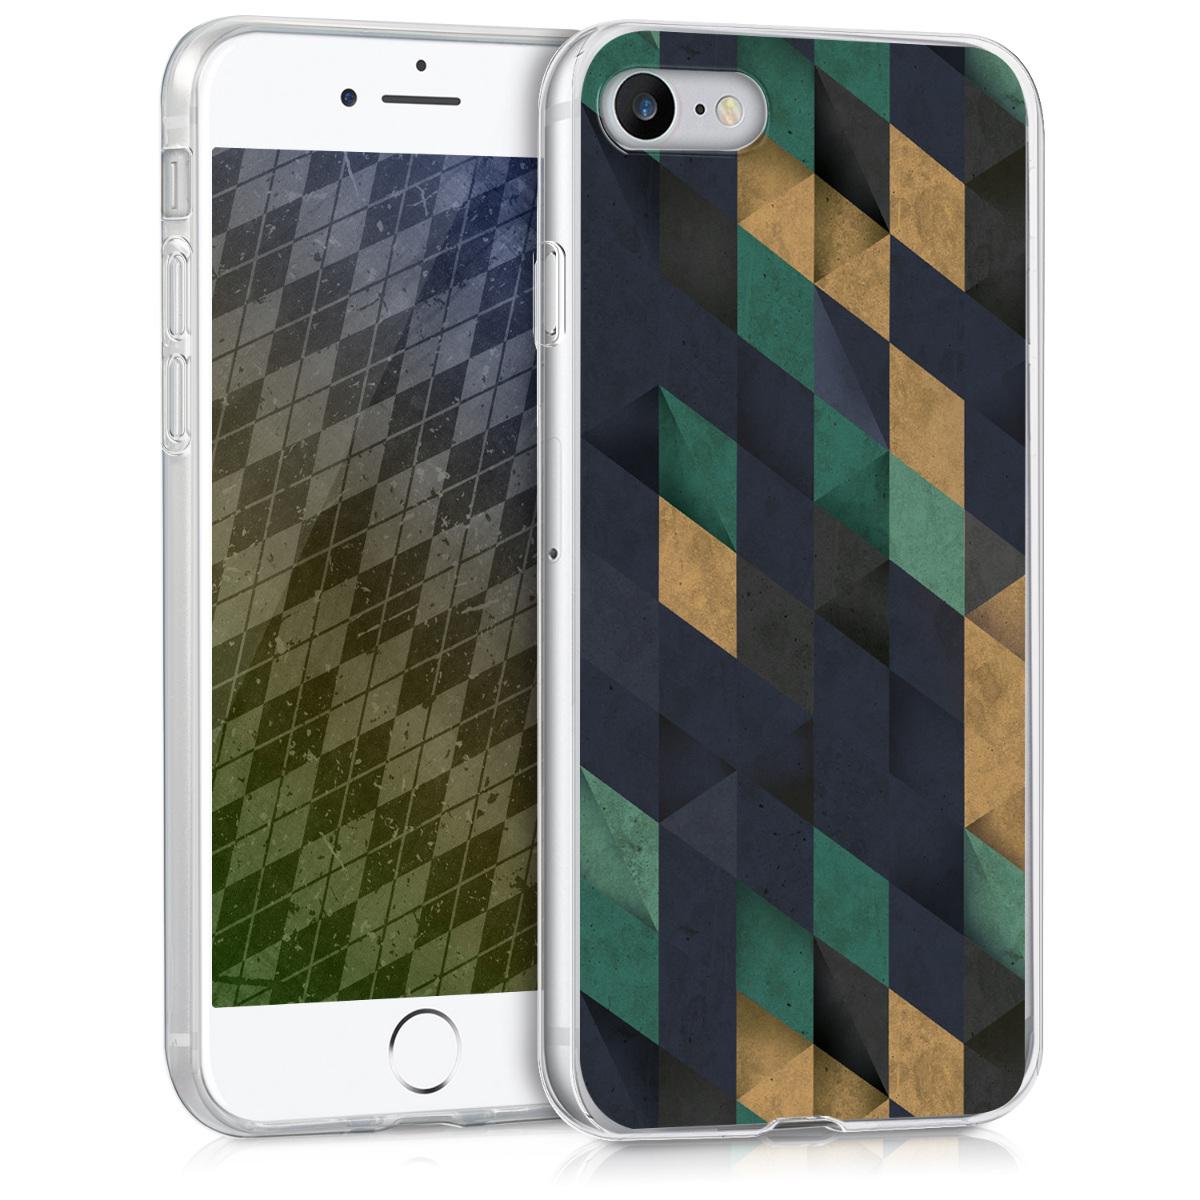 Kvalitní silikonové TPU pouzdro pro Apple iPhone 7 / 8 / SE  - Mosaic Dark Blue | Benzin | Beige